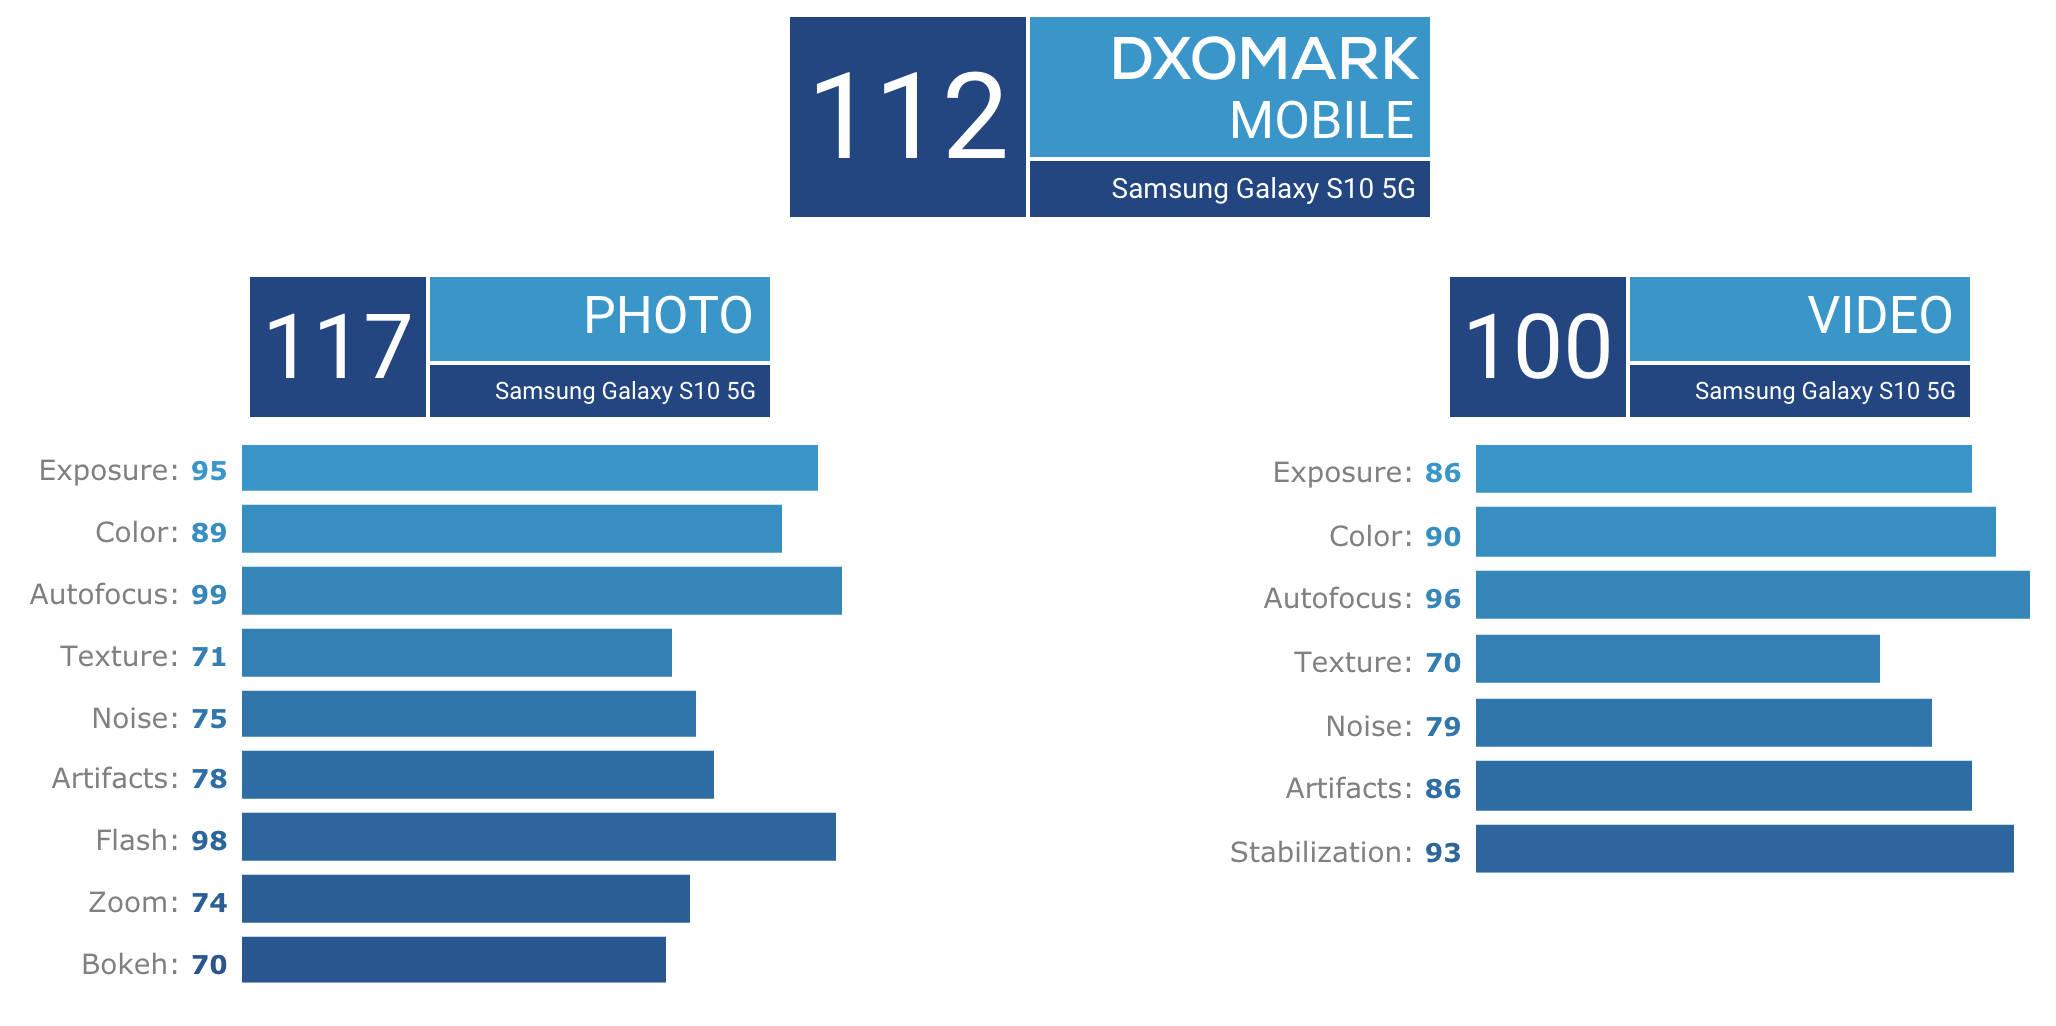 Samsung Galaxy S10 5G DxOMark Mobile aparat vs Huawei P30 Pro porównanie